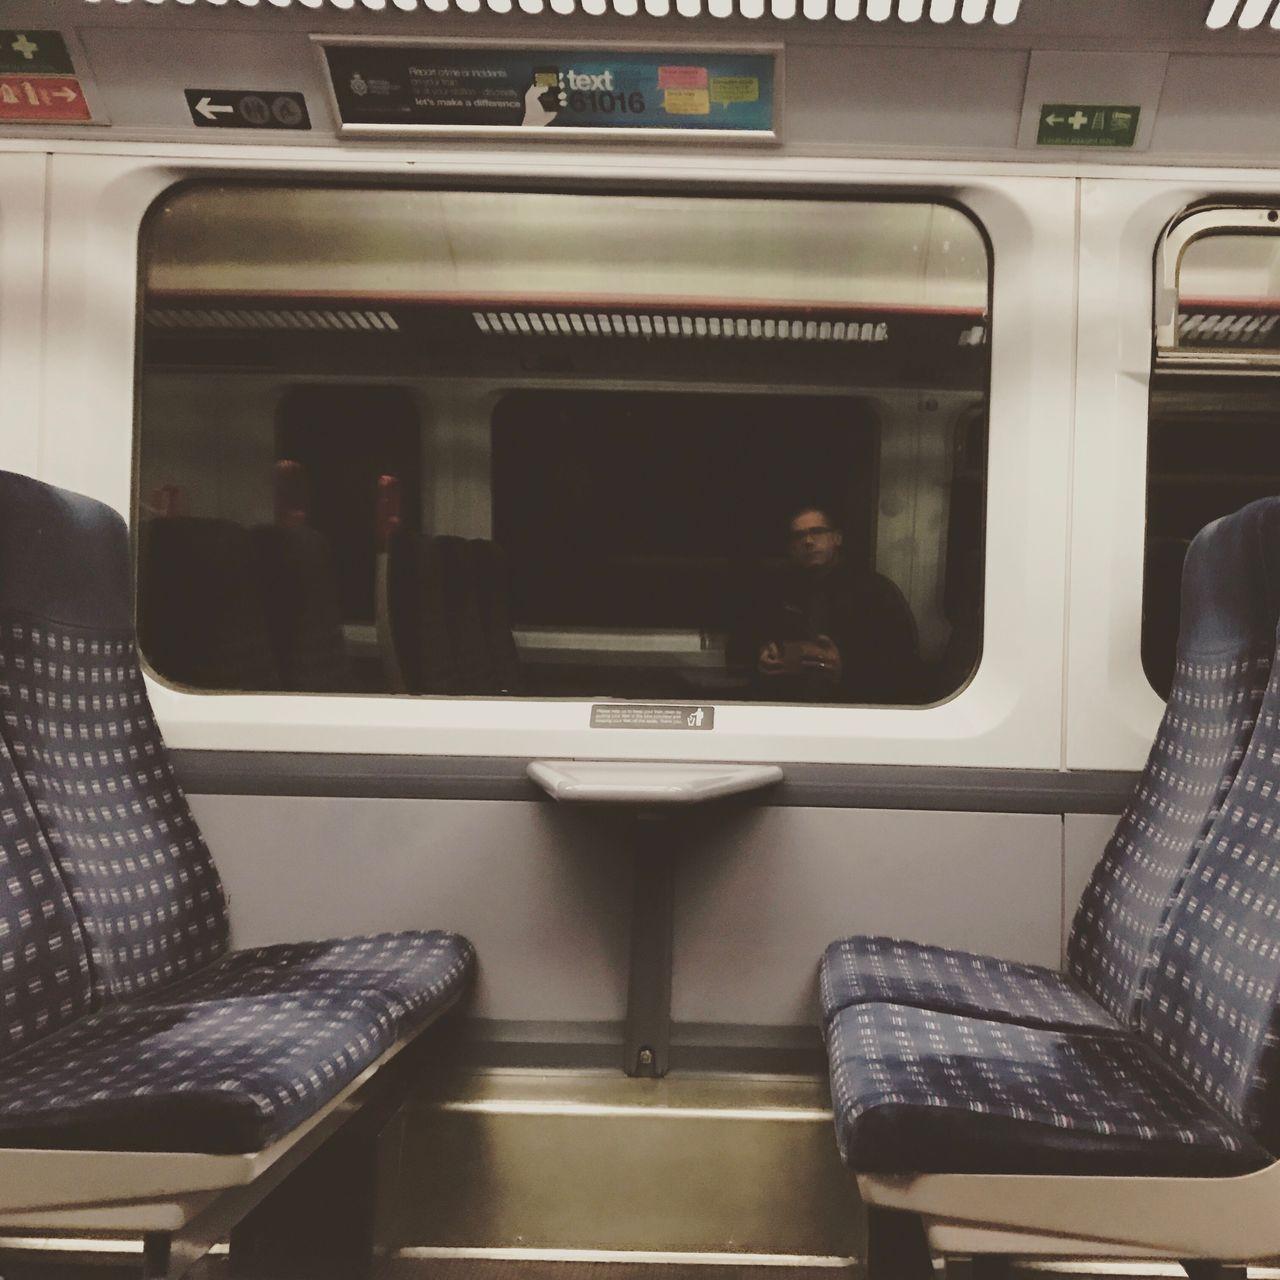 transportation, vehicle interior, indoors, vehicle seat, public transportation, no people, day, train interior